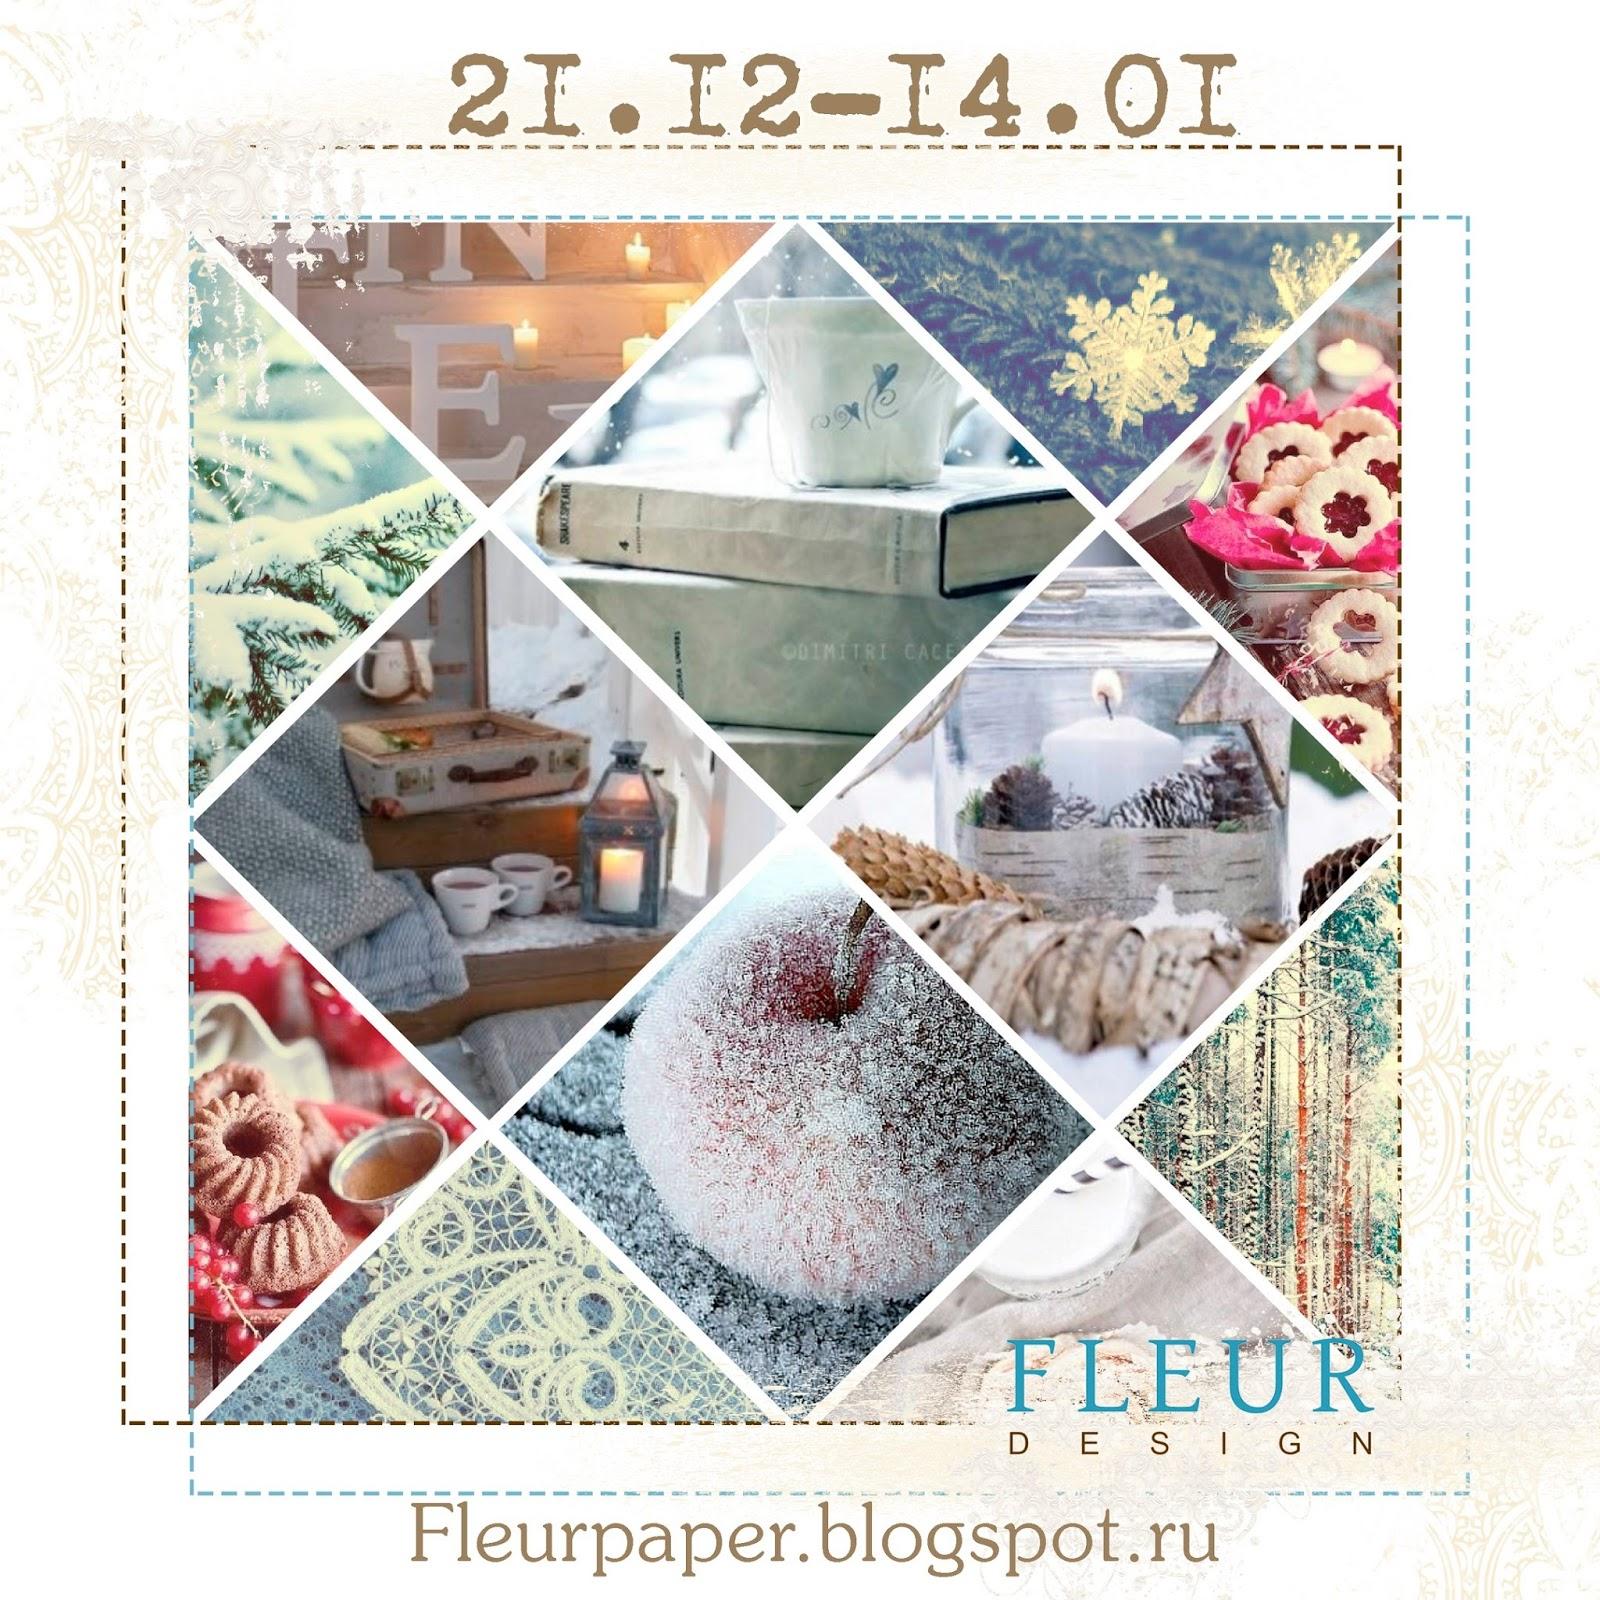 http://fleurpaper.blogspot.com/2015/12/5.html